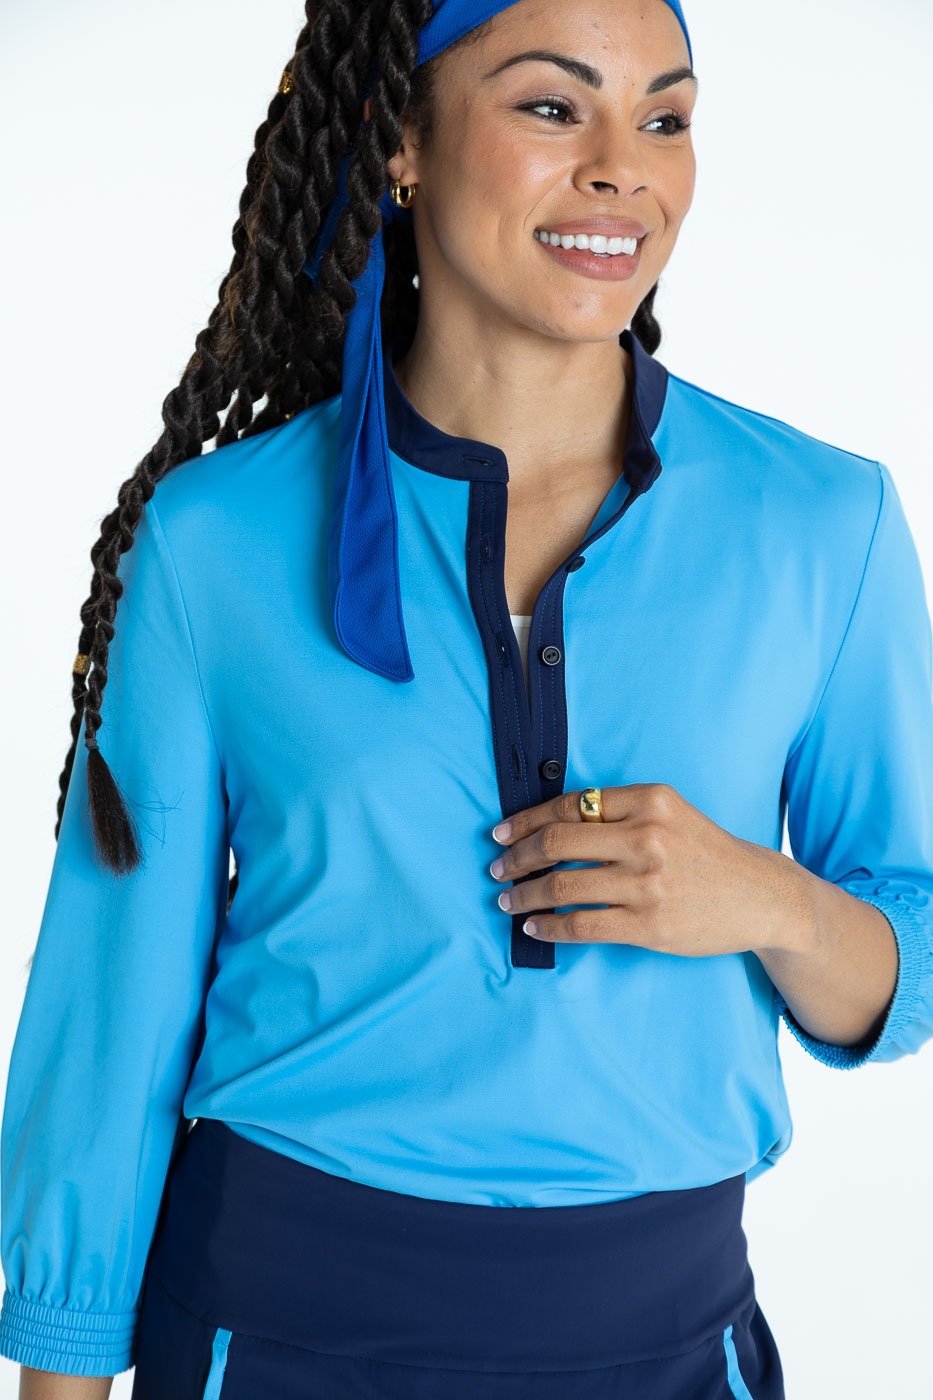 Smiling woman golfer wearing a cornflower blue Swing Easy 3/4 Sleeve golf shirt